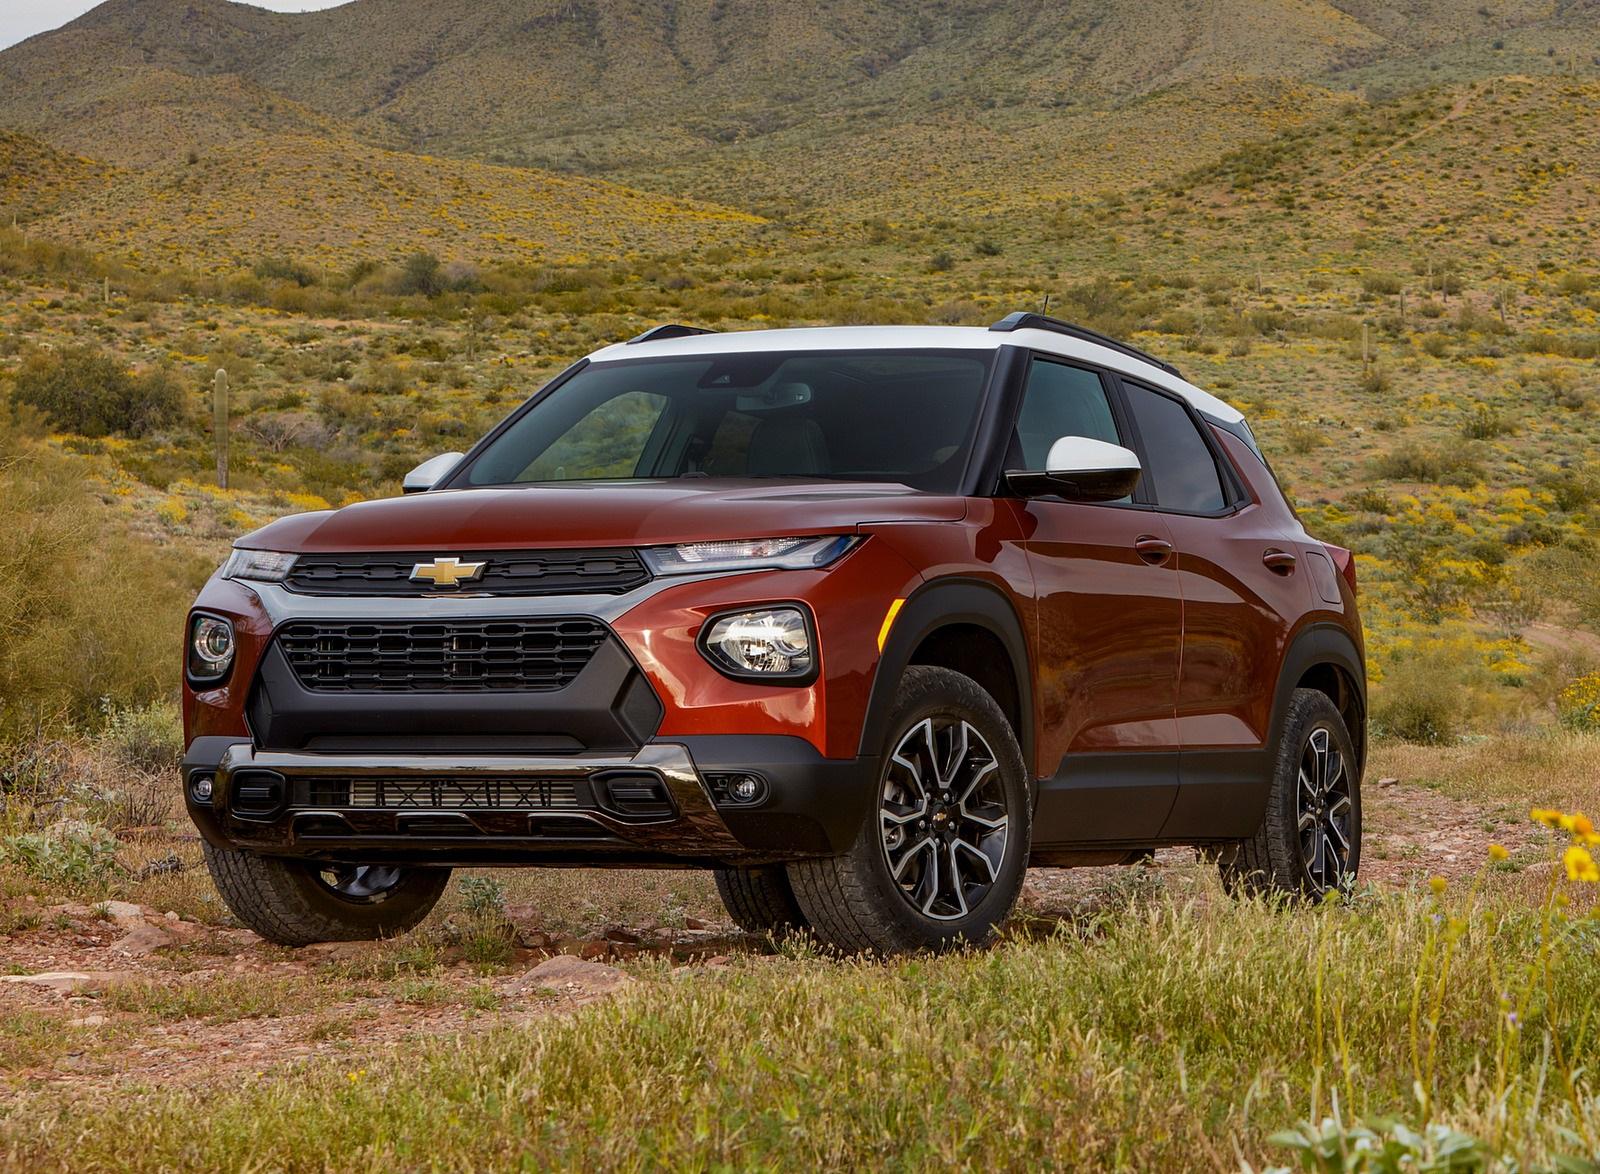 2021 Chevrolet Trailblazer ACTIV Front Three-Quarter Wallpapers (1)